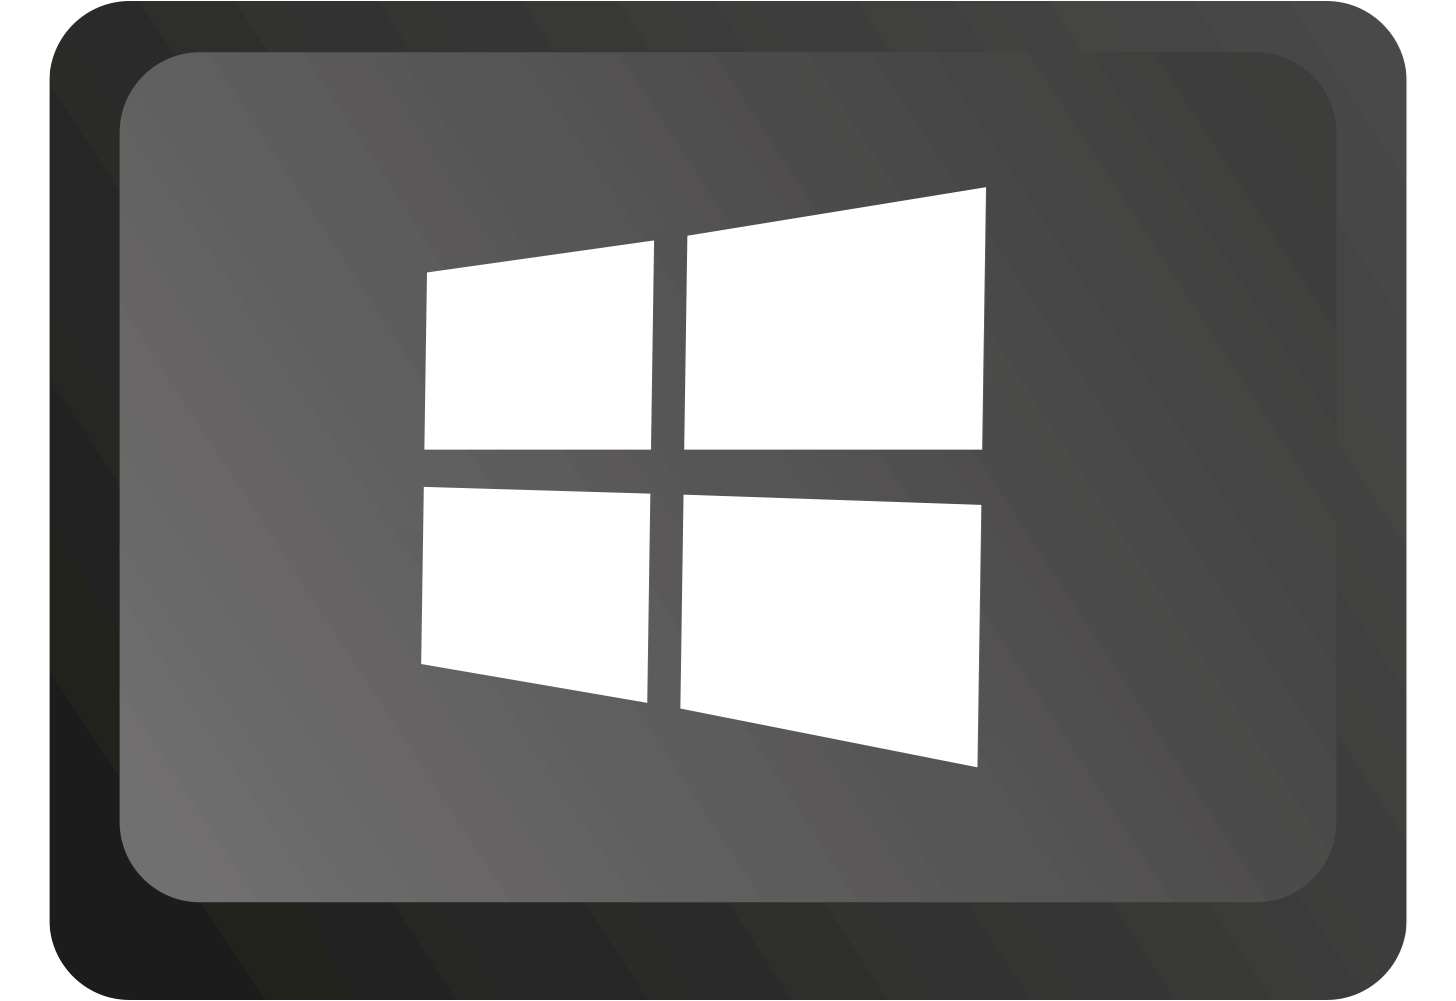 Velg rett gamingtastatur NetOnNet.no prispresseren på: Blu